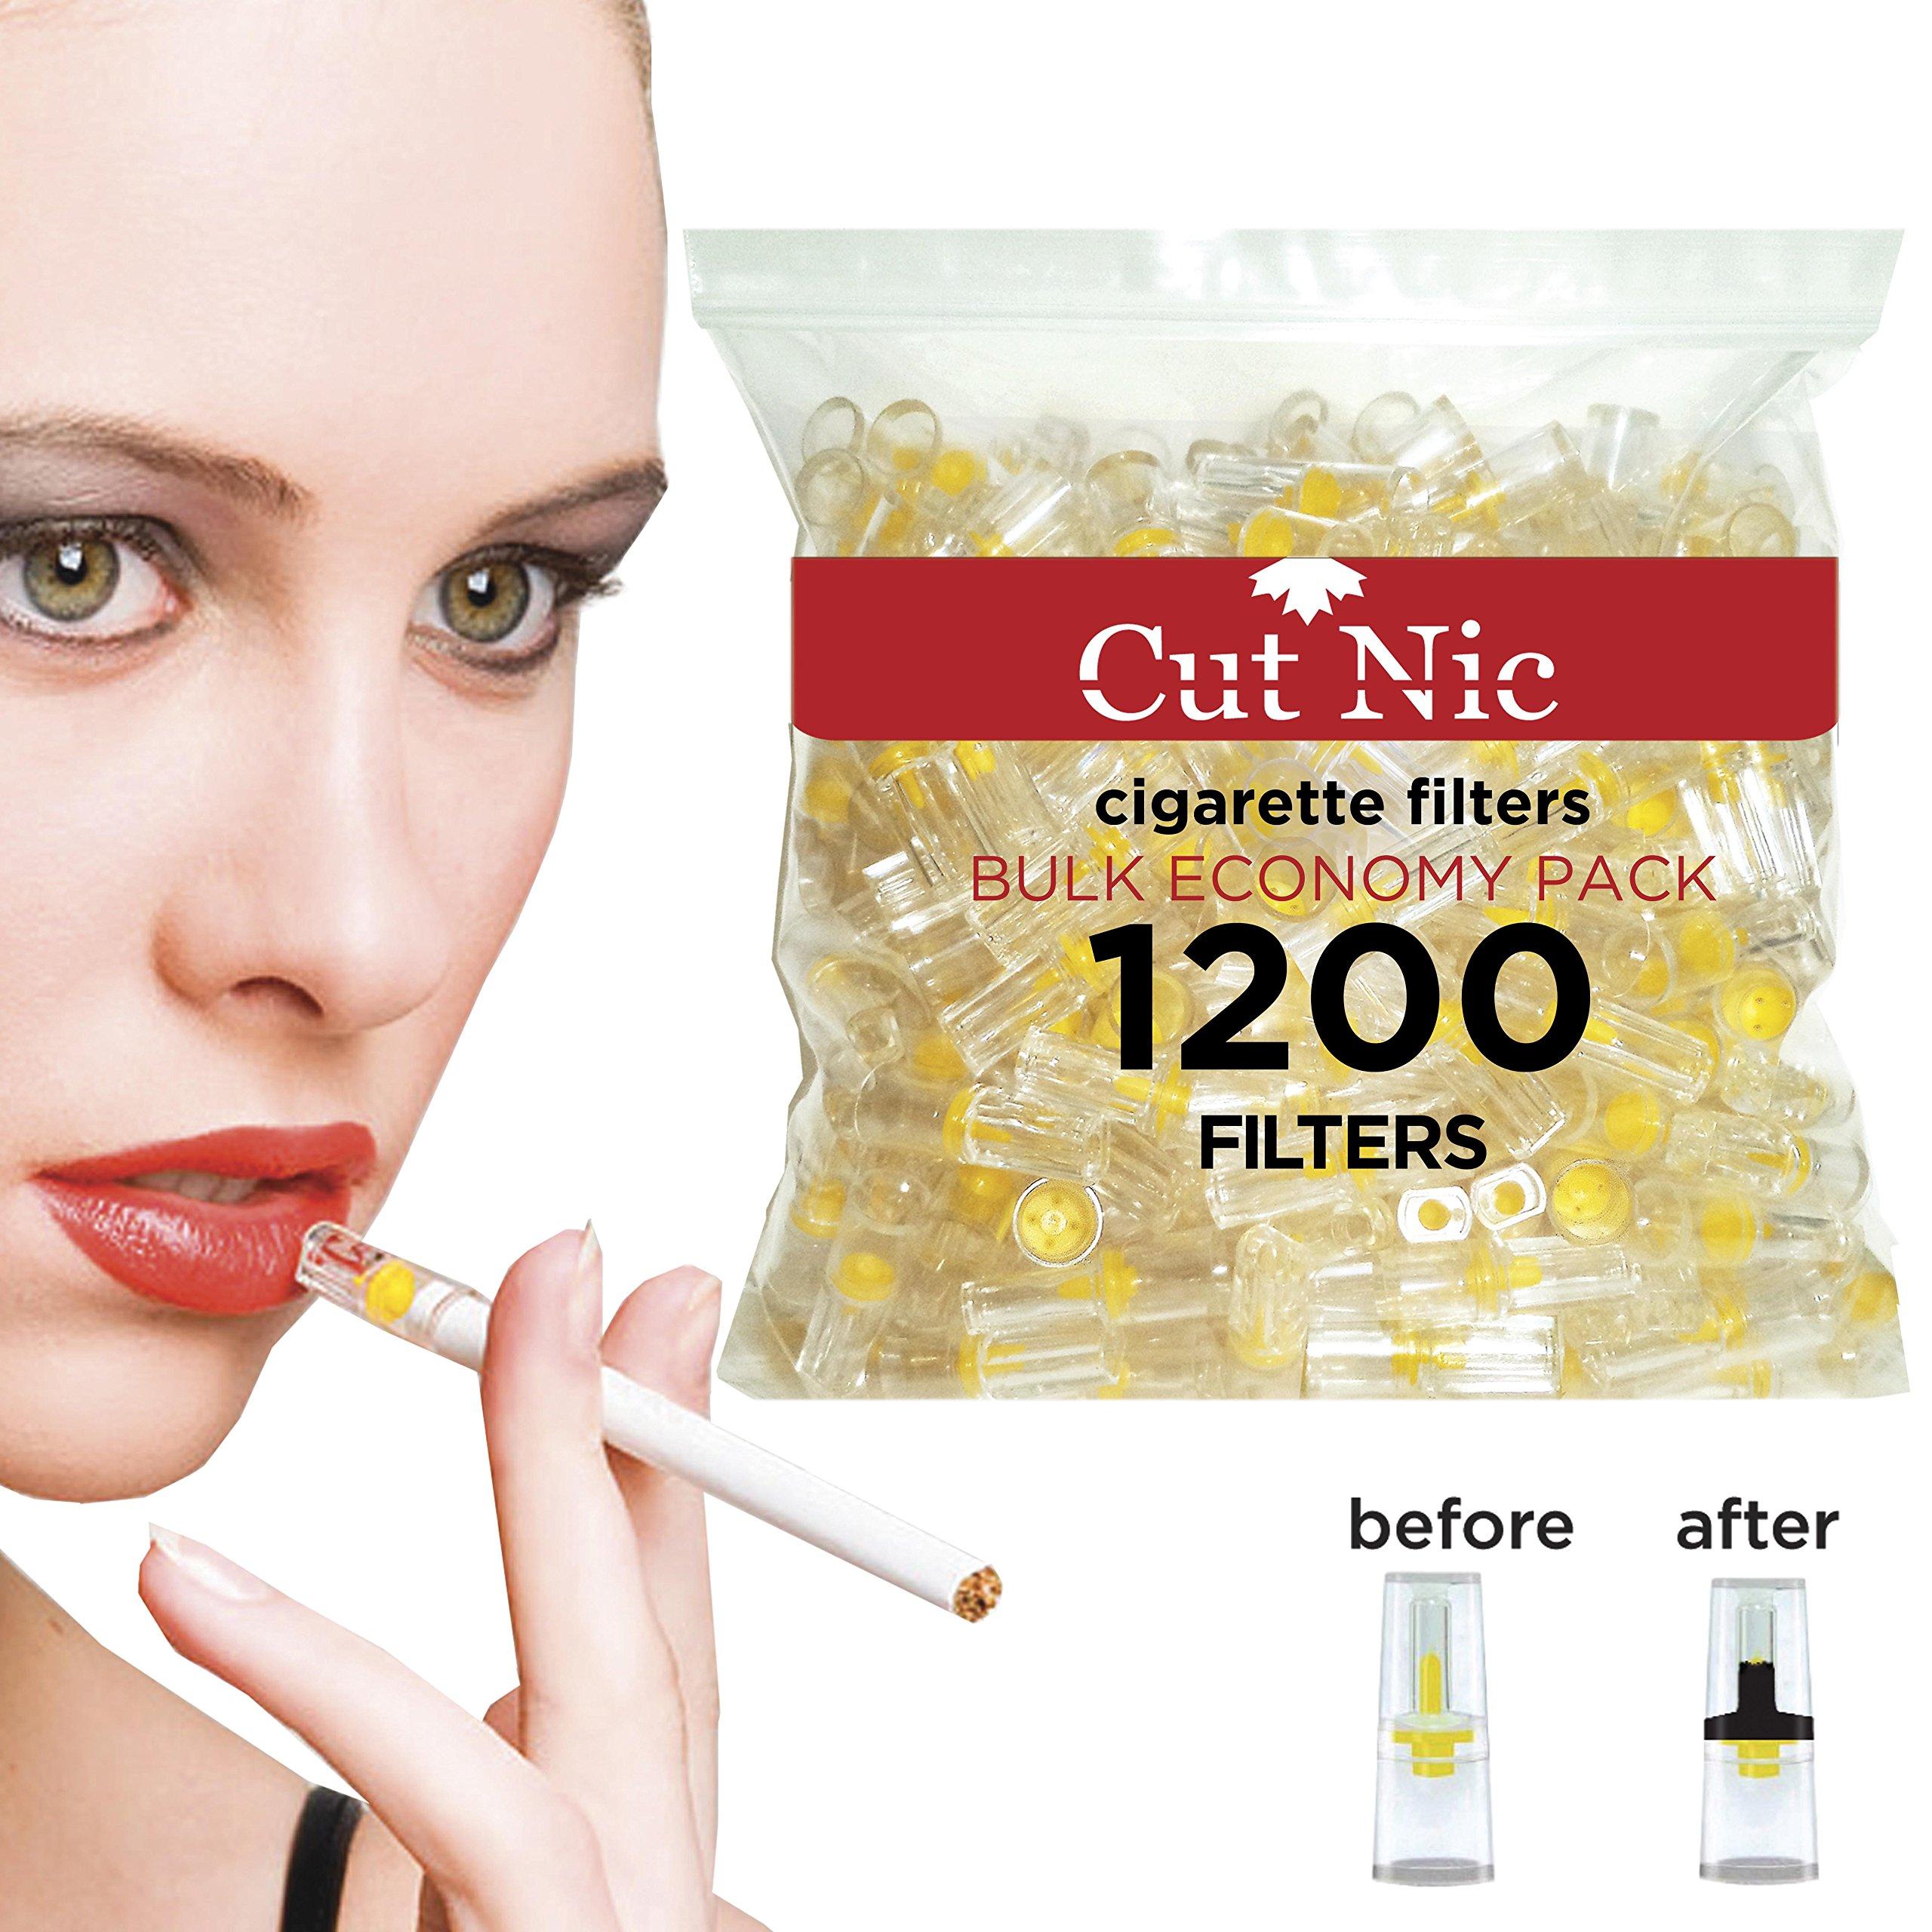 Cut-Nic 4 HOLE Disposable Cigarette Filters - Bulk Economy Pack (1200 Per Pack)